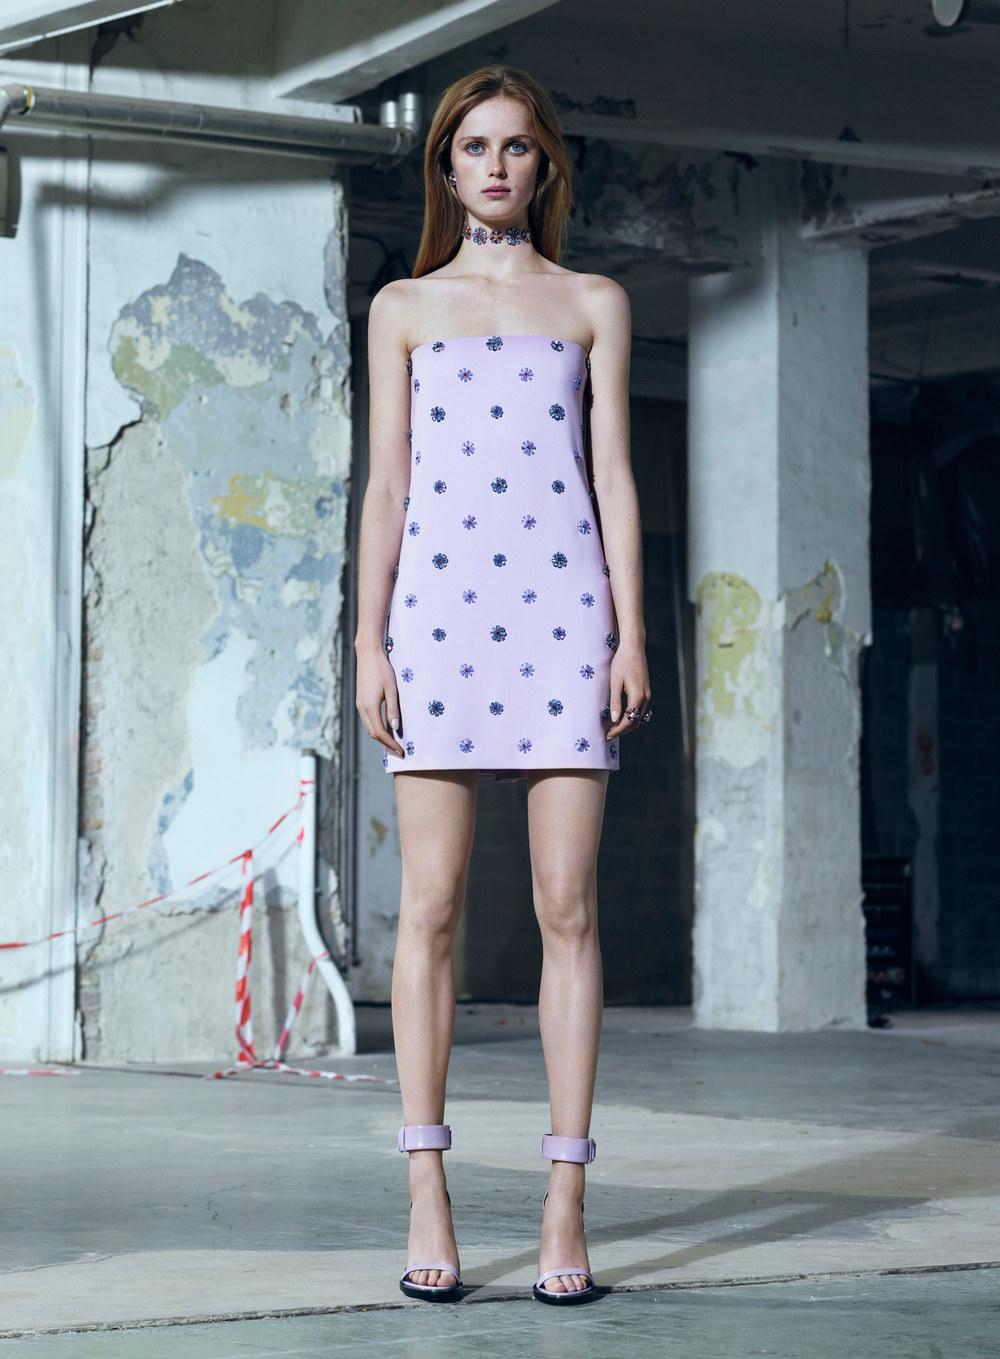 versace-pre-fall-2016-lookbook-34.jpg